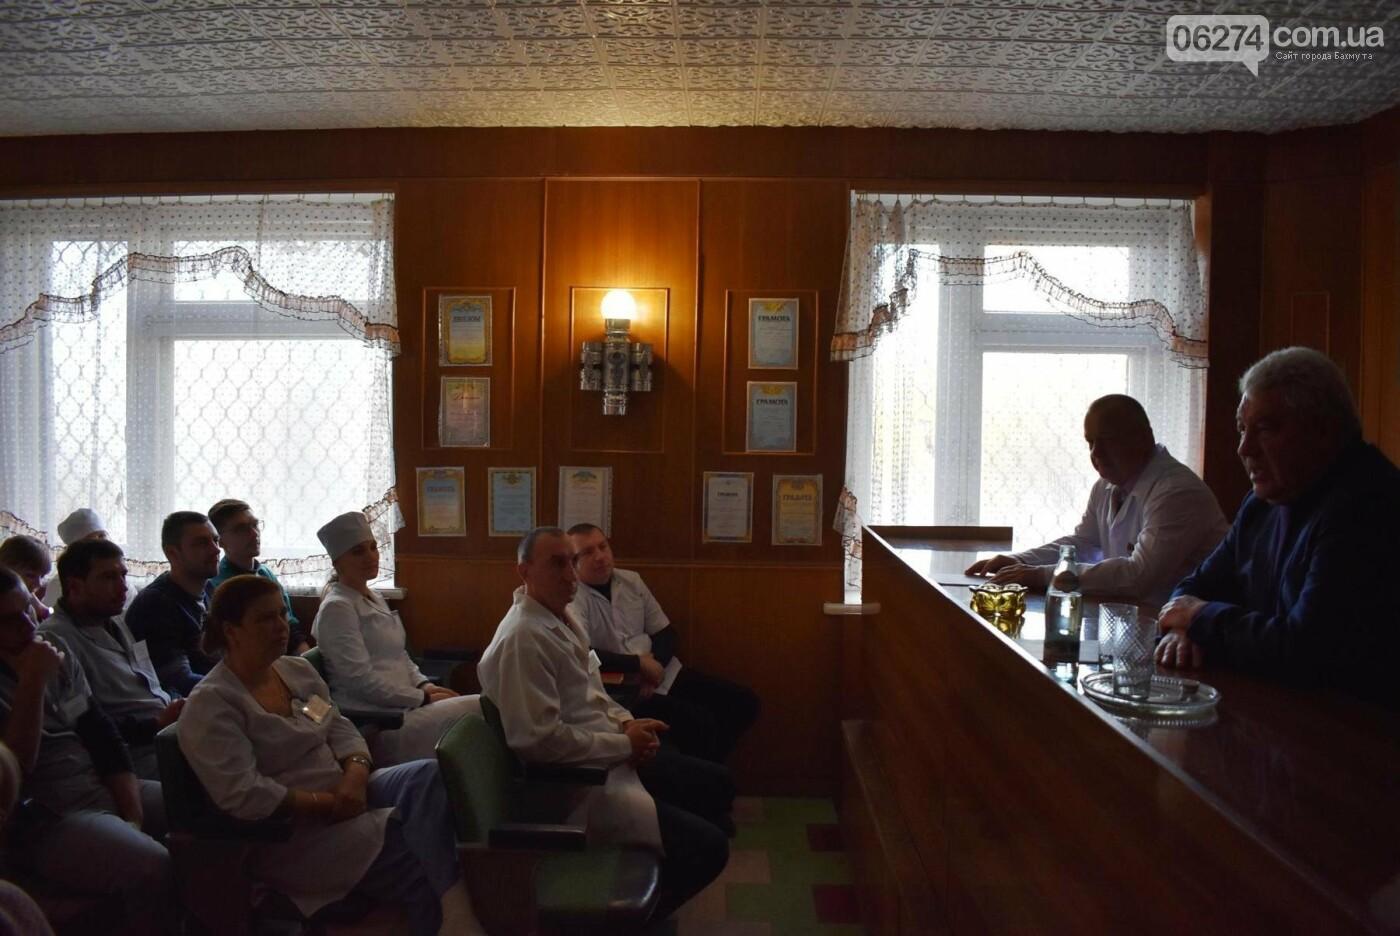 Мэр Бахмута Алексей Рева провел рабочую встречу с коллективом стоматполиклиники, фото-1